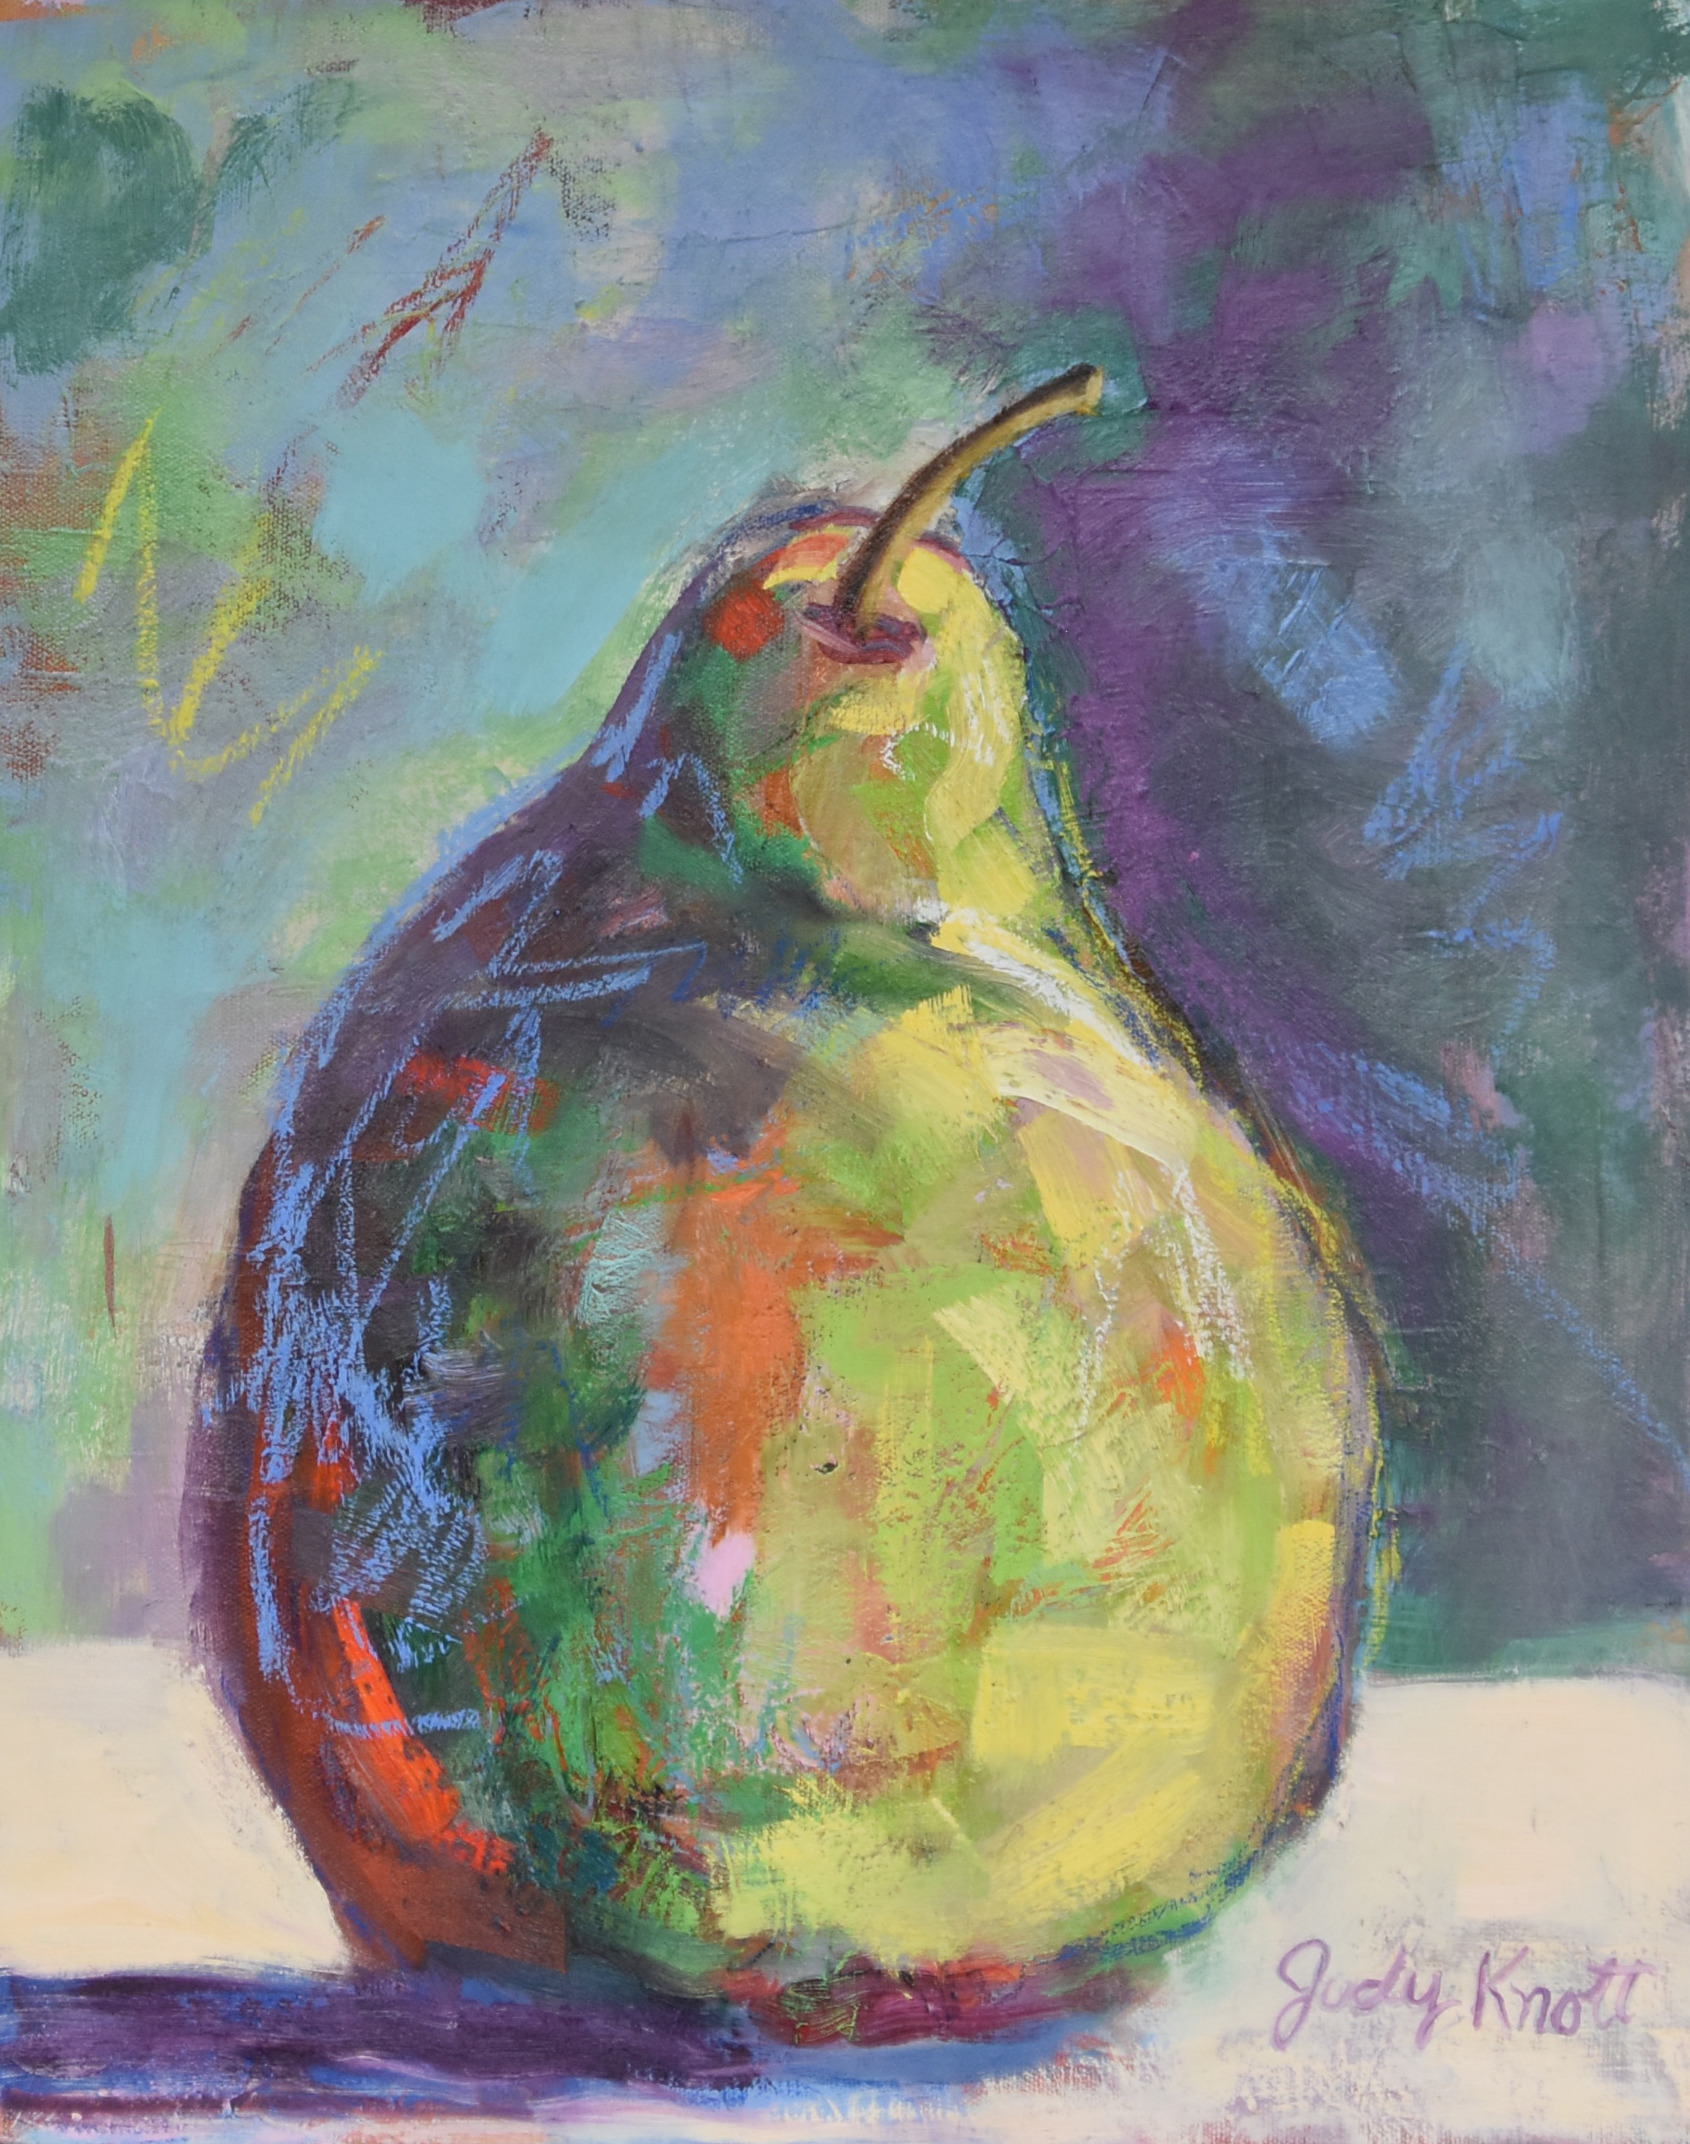 One single pear qhvll9